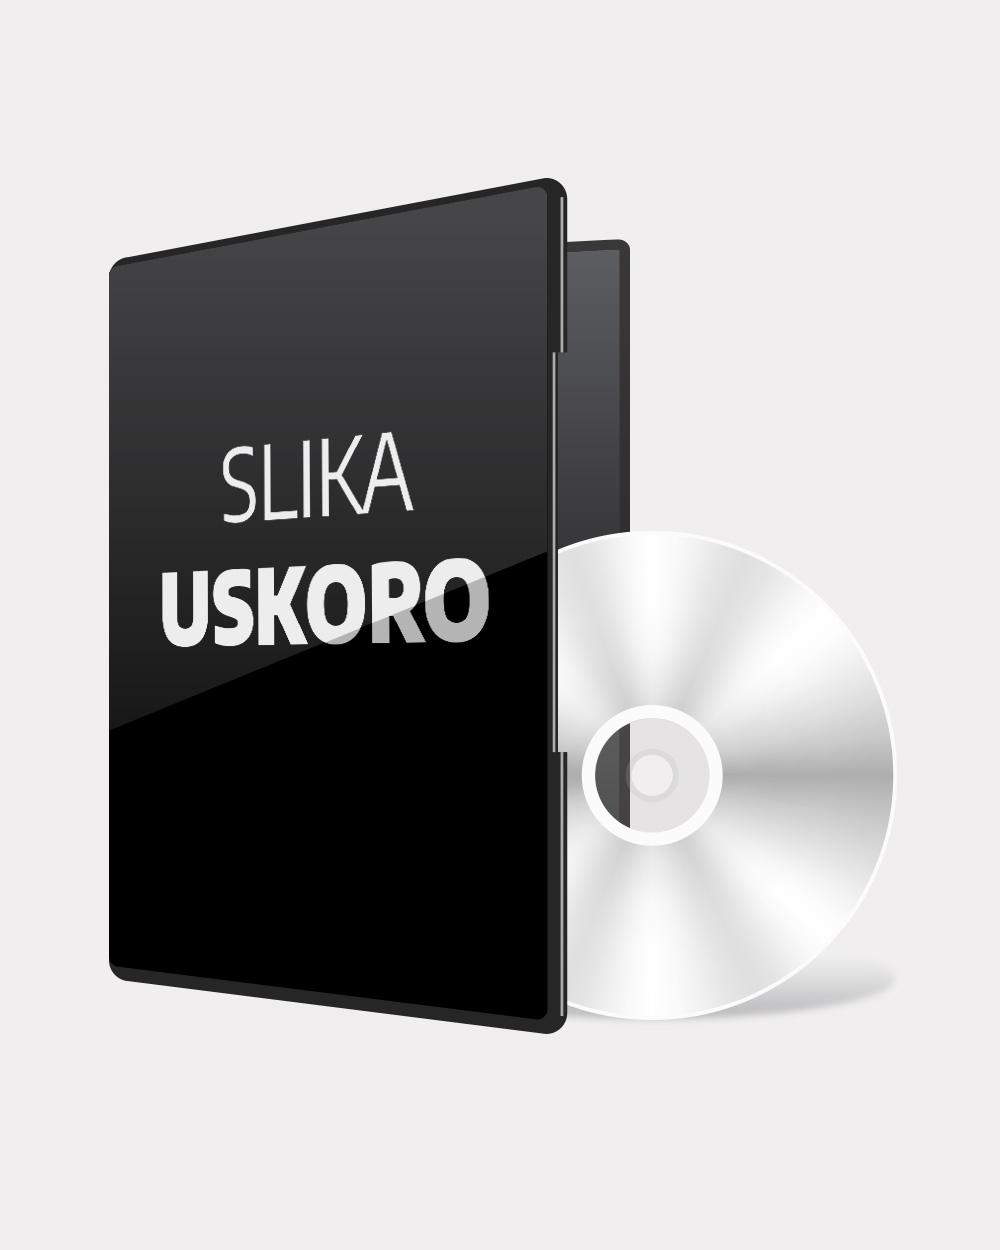 PS4 Kingdom Come Deliverance Special Edition